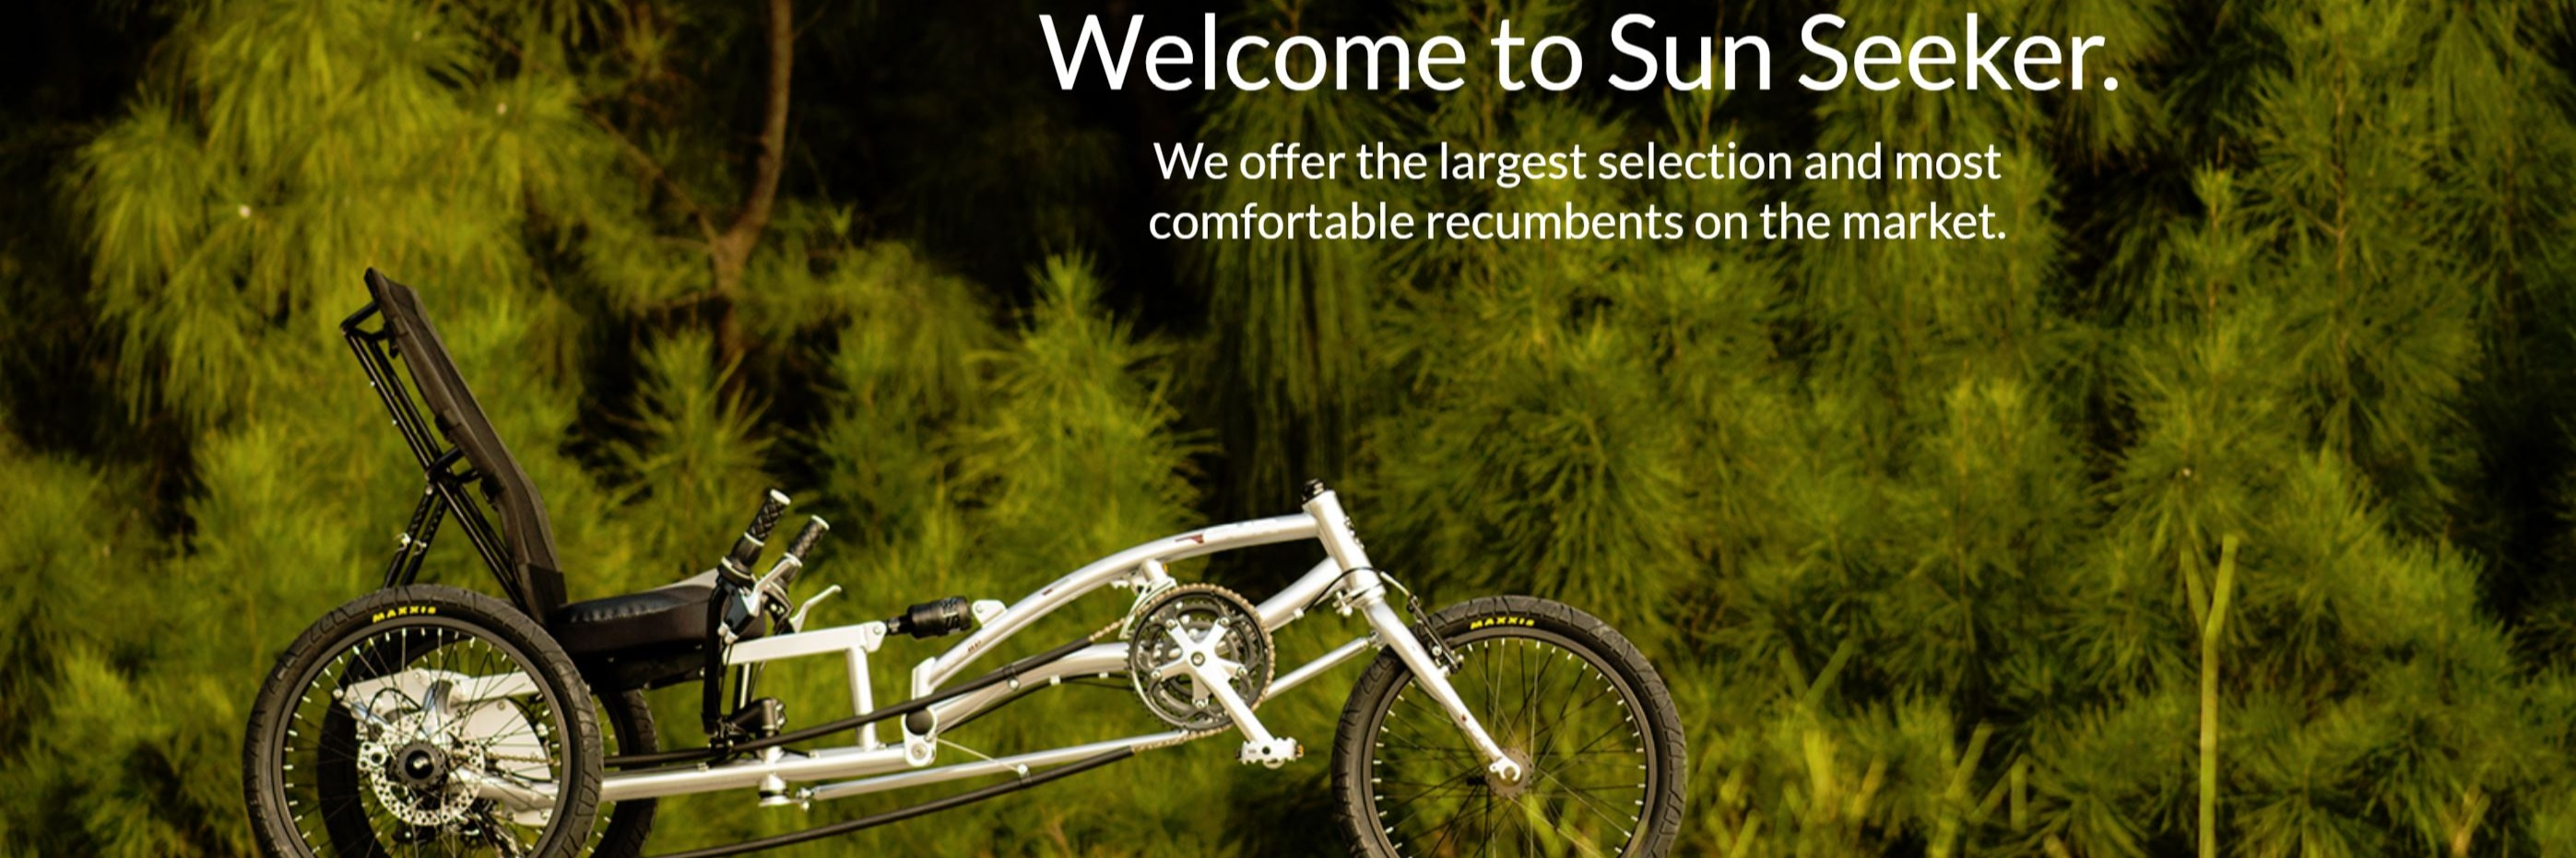 Sun Seeker bikes